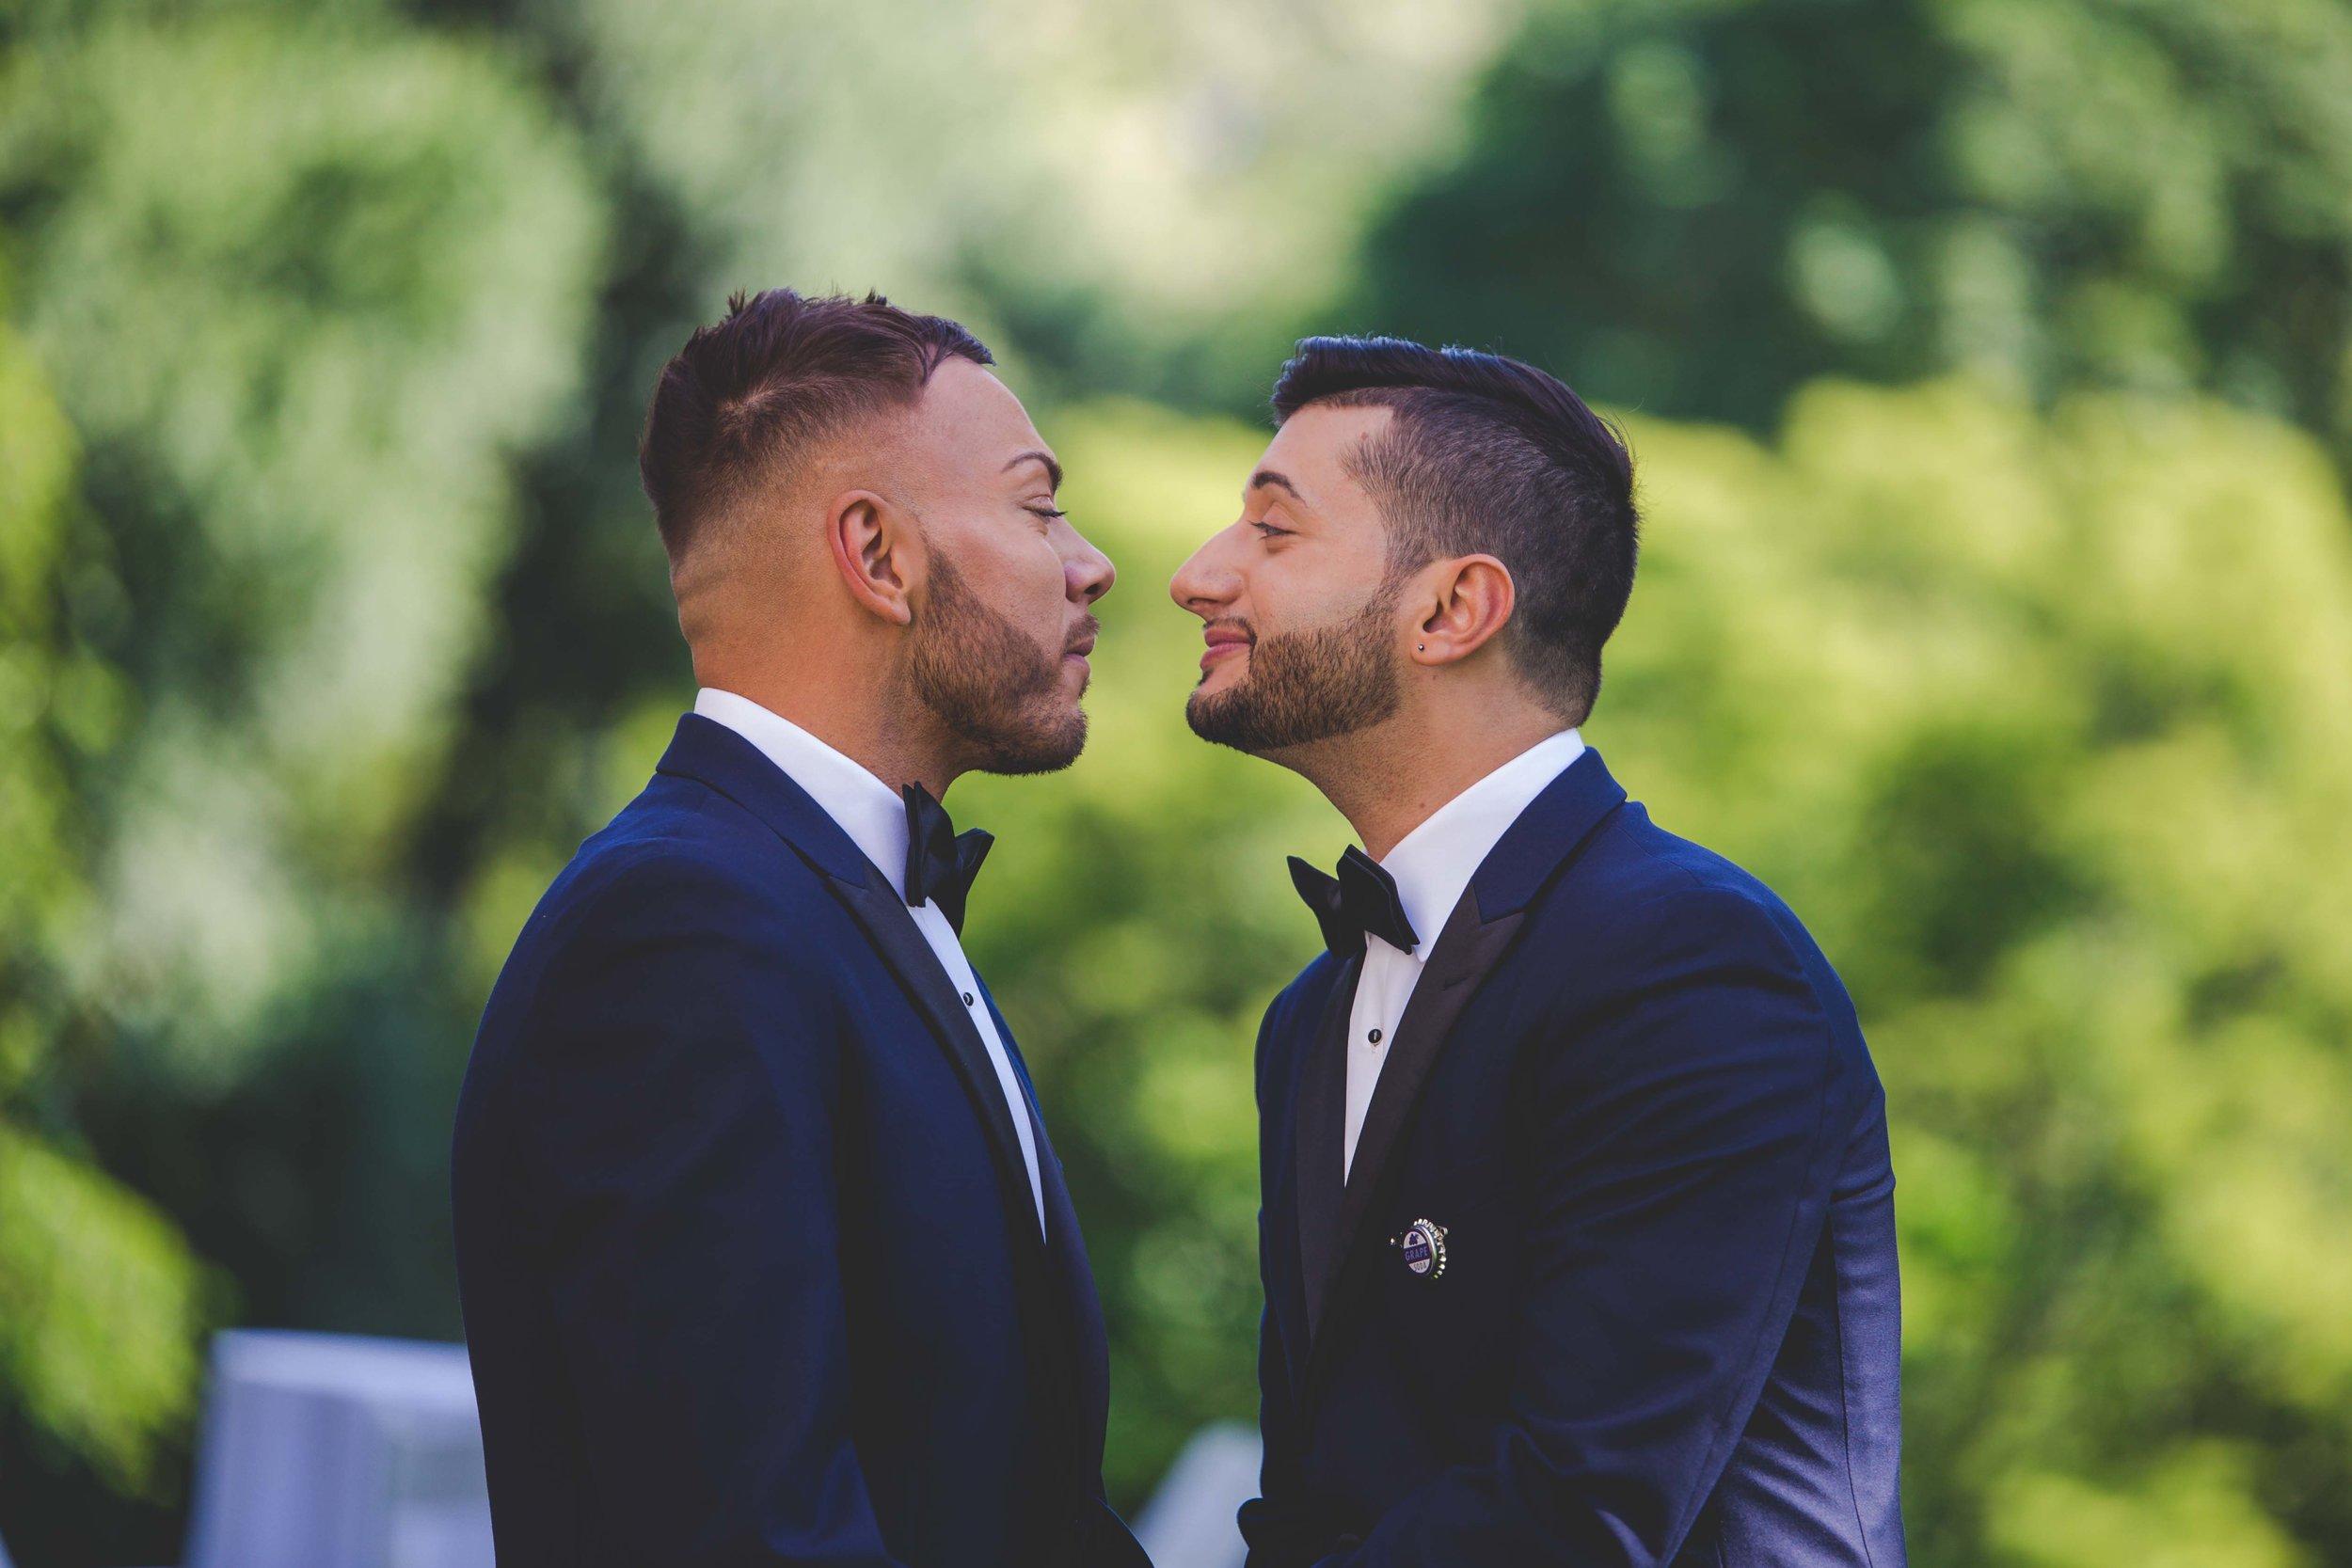 lyndhurst-mansion-amazing-gay-wedding-7.jpg